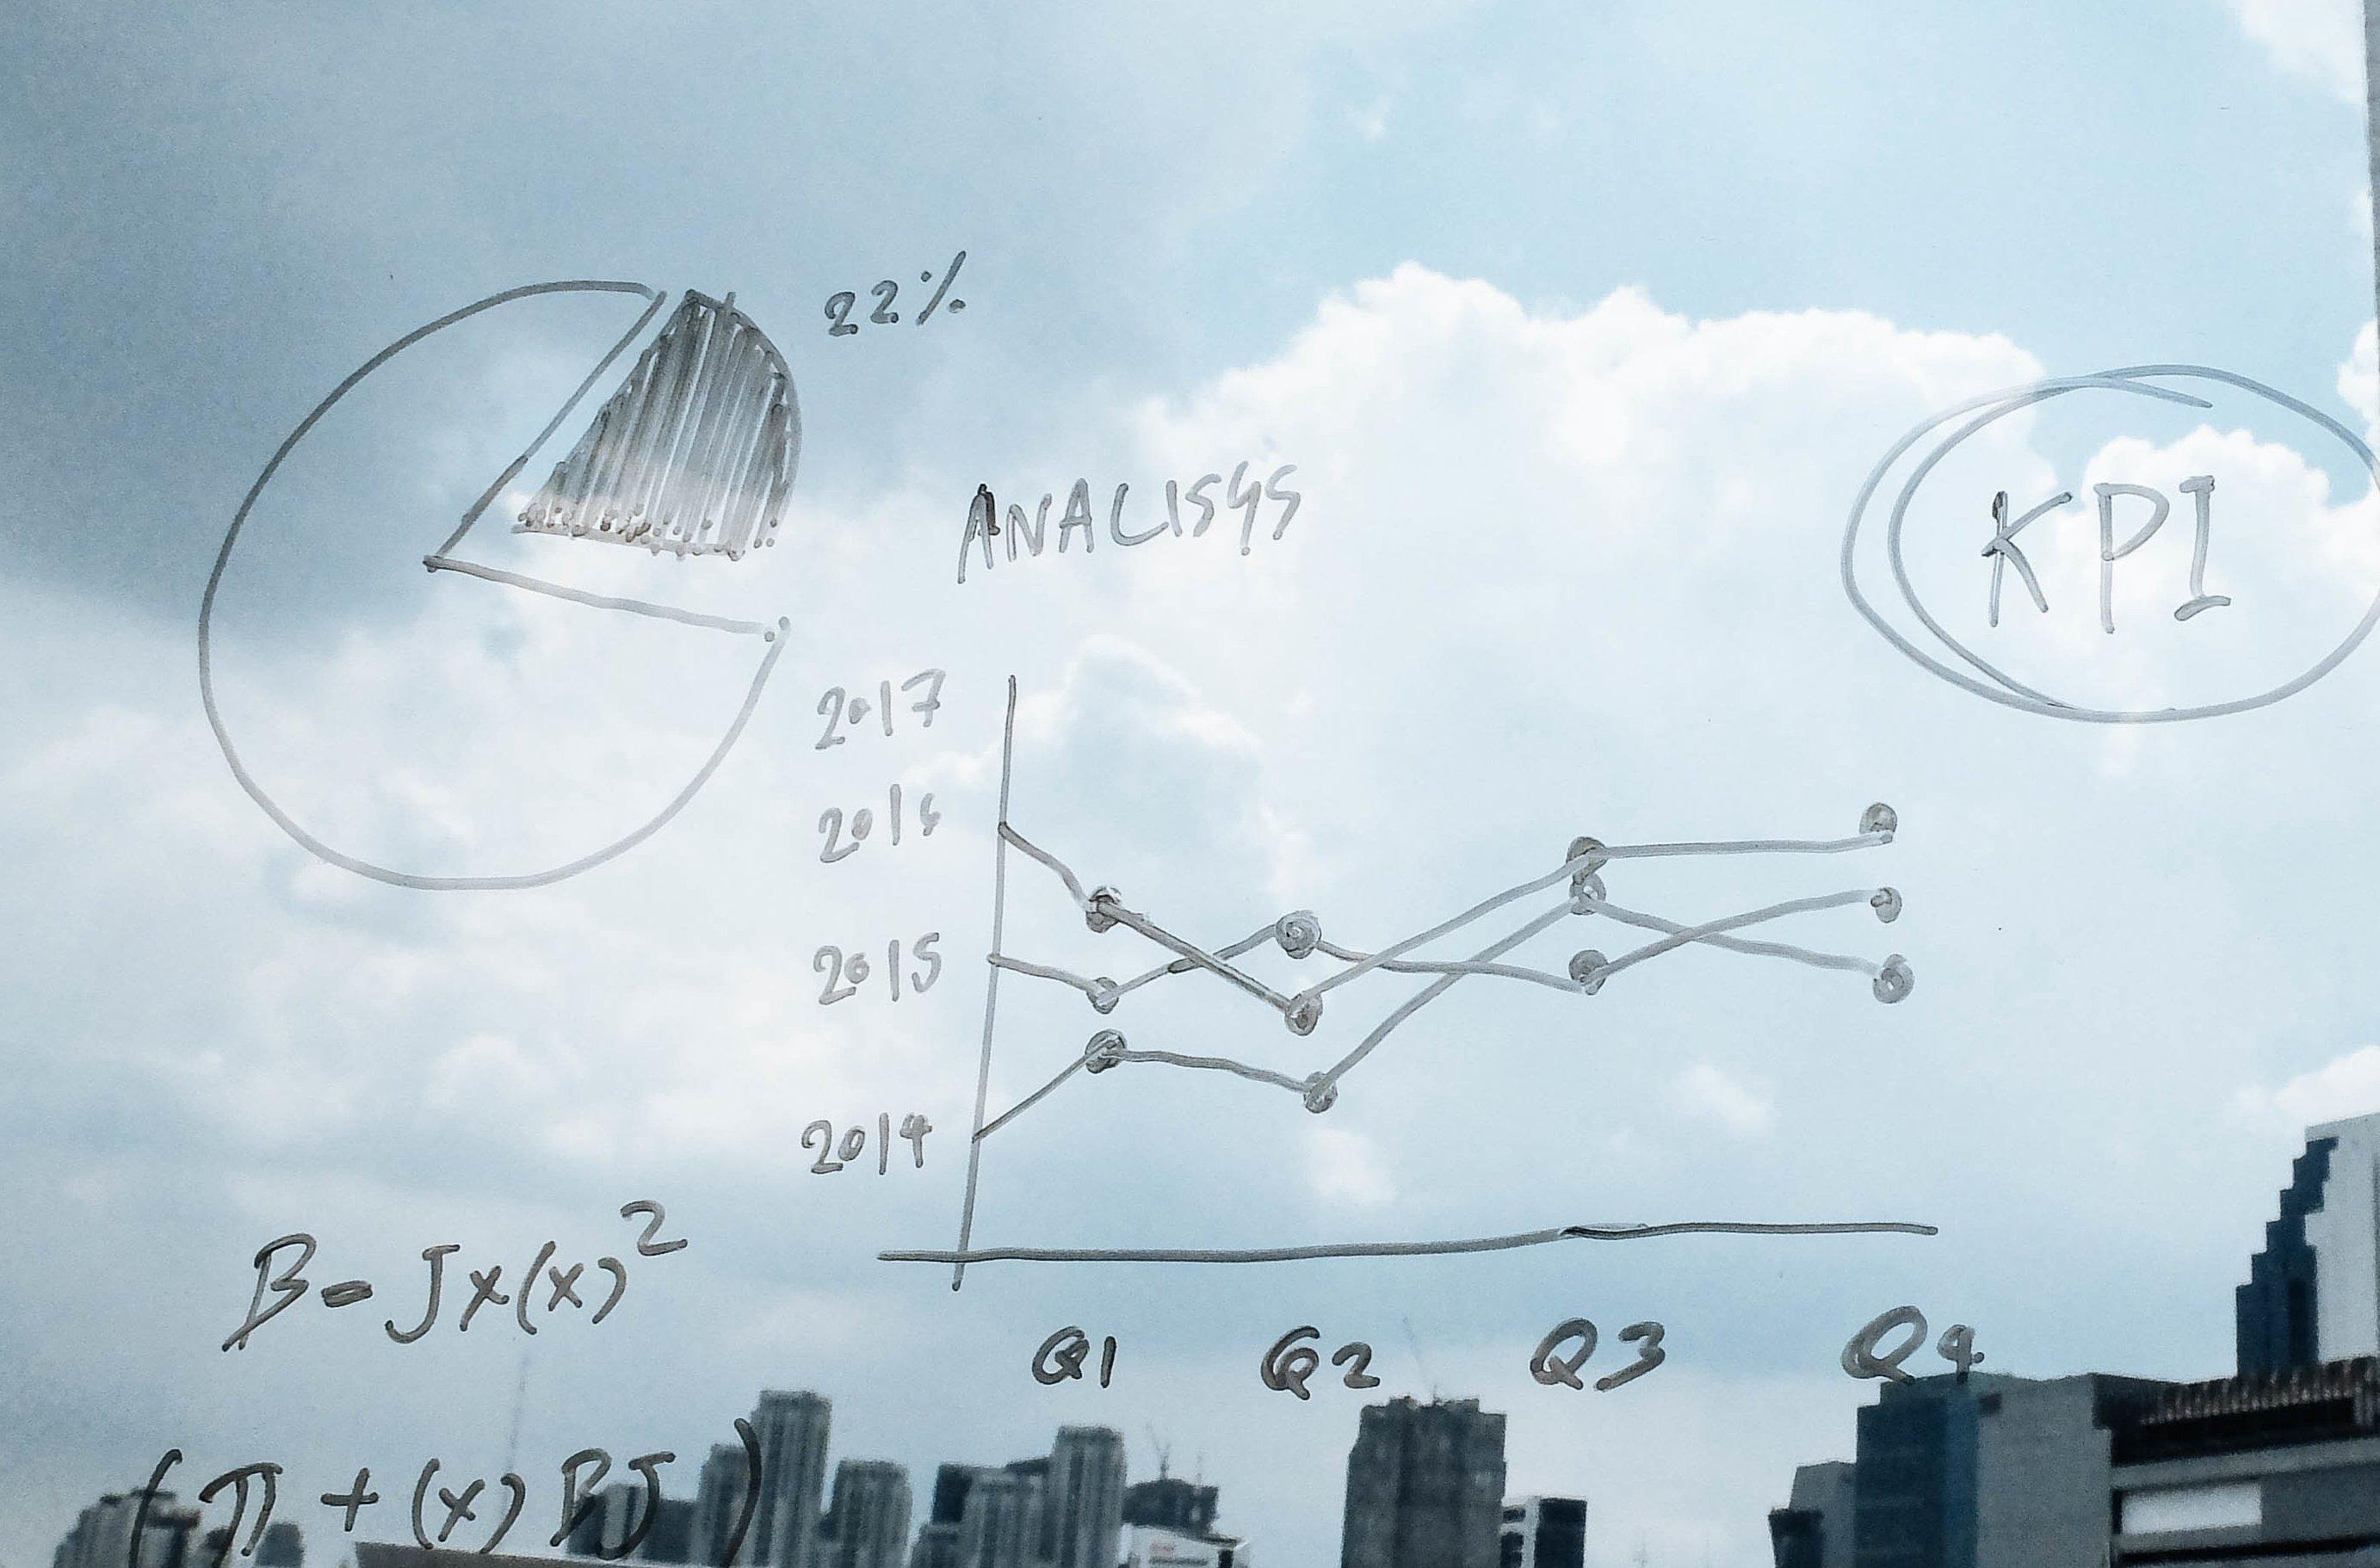 analysis-chart-VKKE9RY